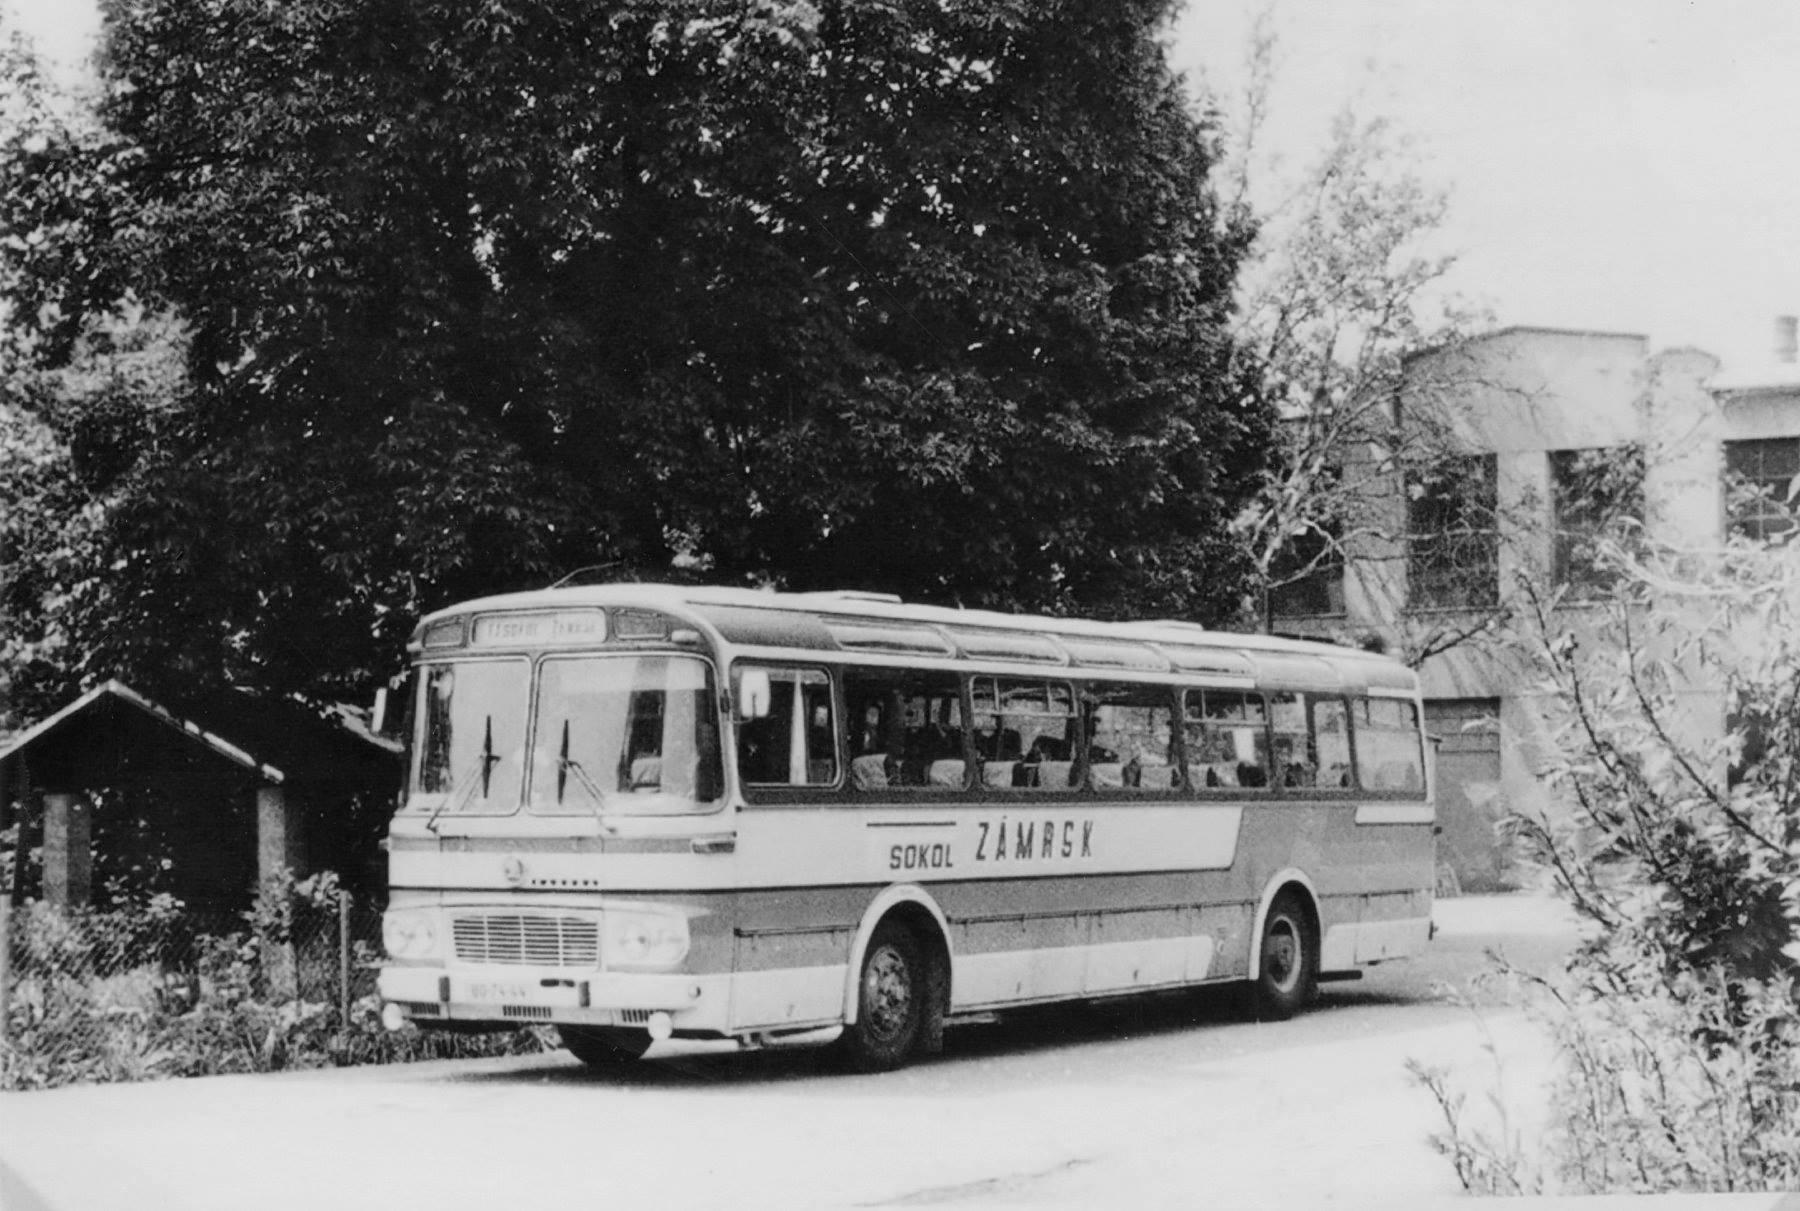 In-1986-nam-de-oudere-bus-karosa-cr-11-met-hoge-zetels-ook-tj-sokol-zamrsk